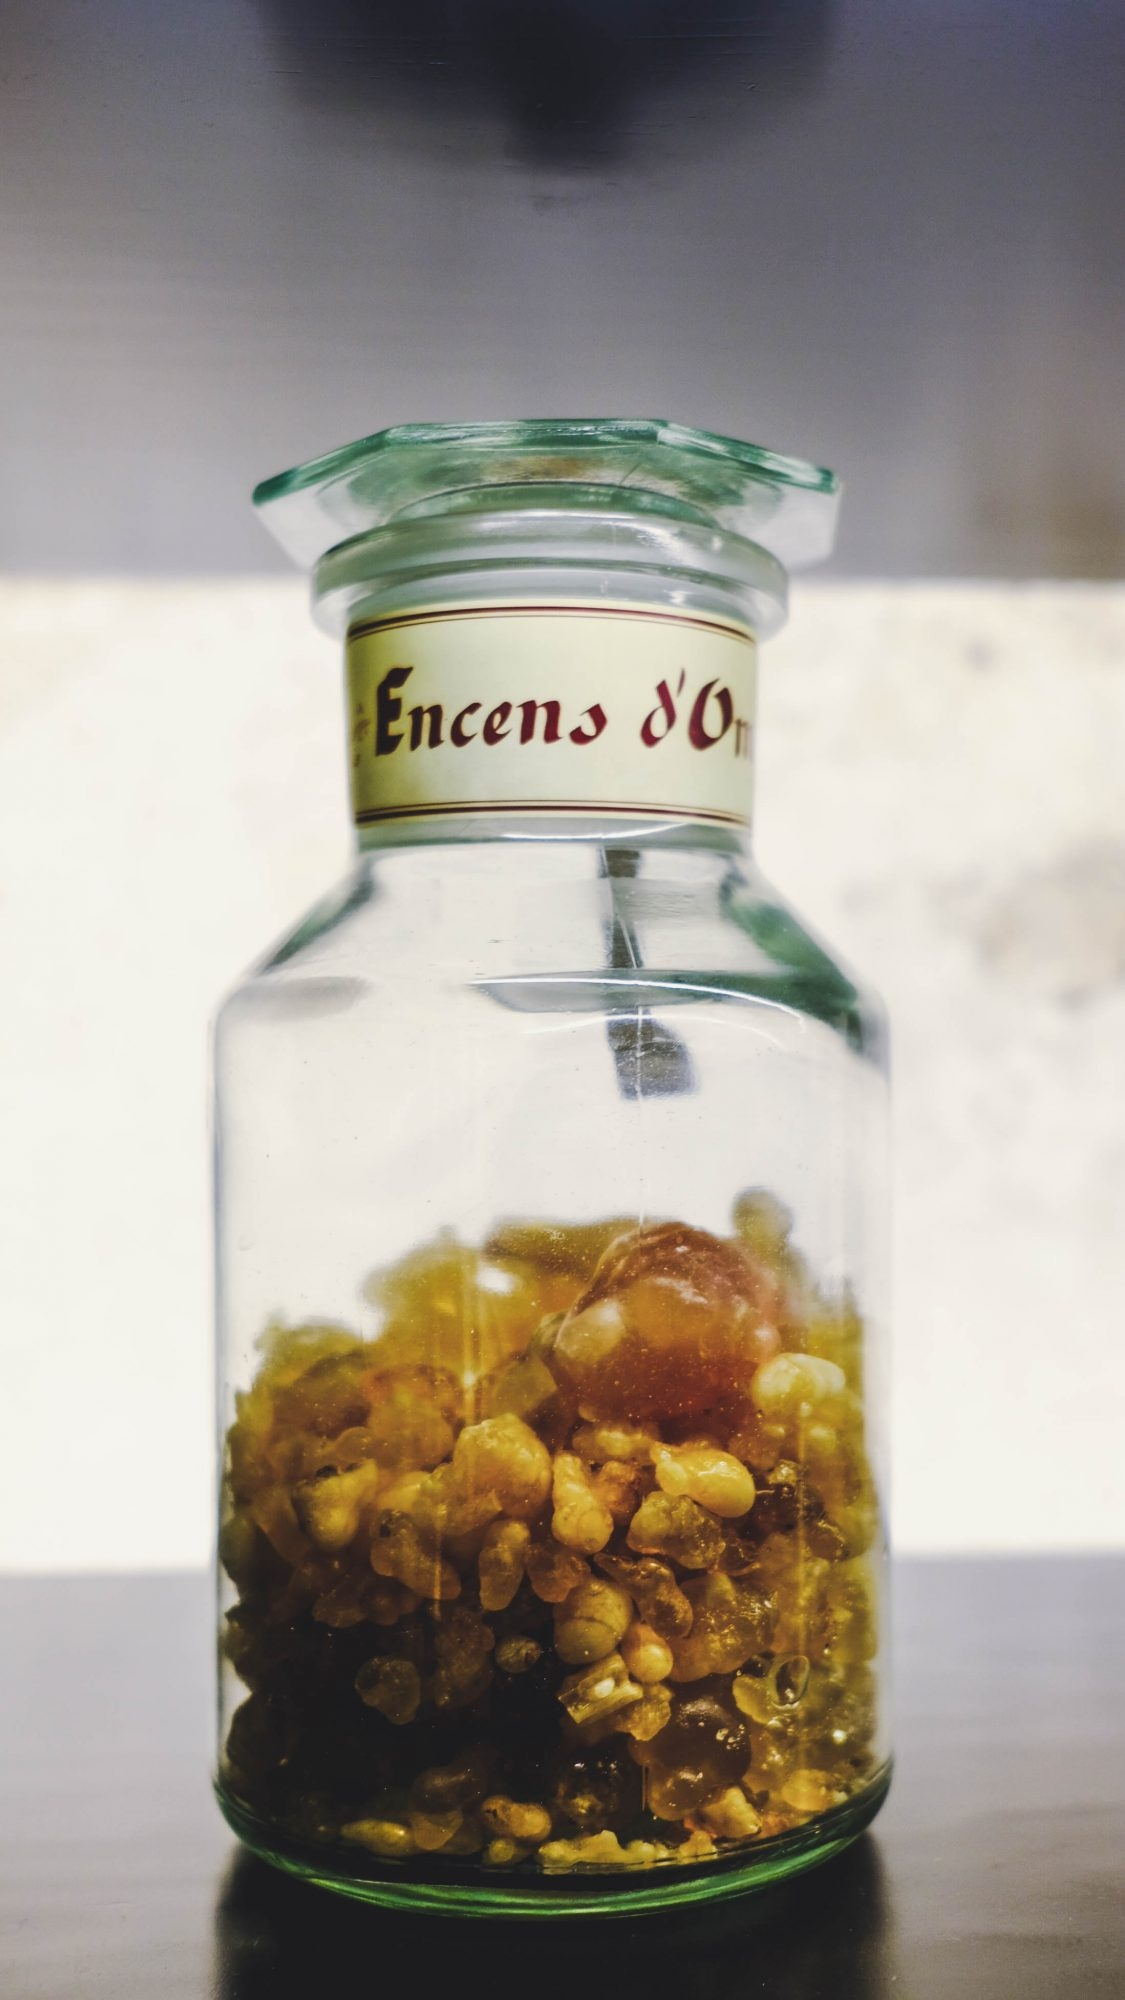 Encens d'or - Grenade Andalousie